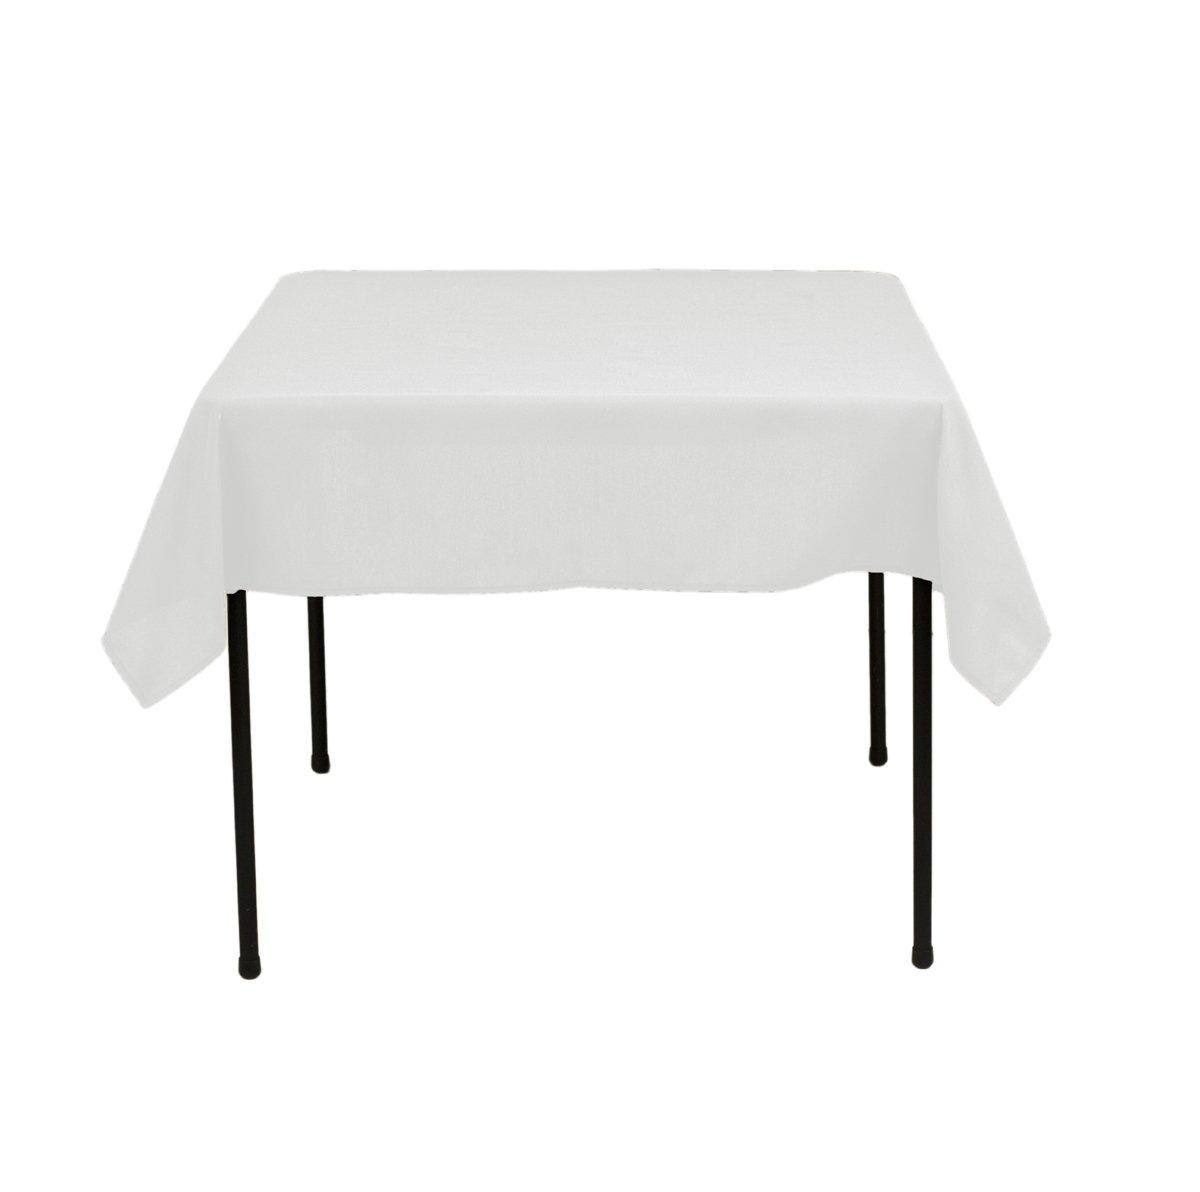 ArtOFabric LinenTablecloth 52-Inch Square Ambassador Tablecloth White [Misc.] at Sears.com